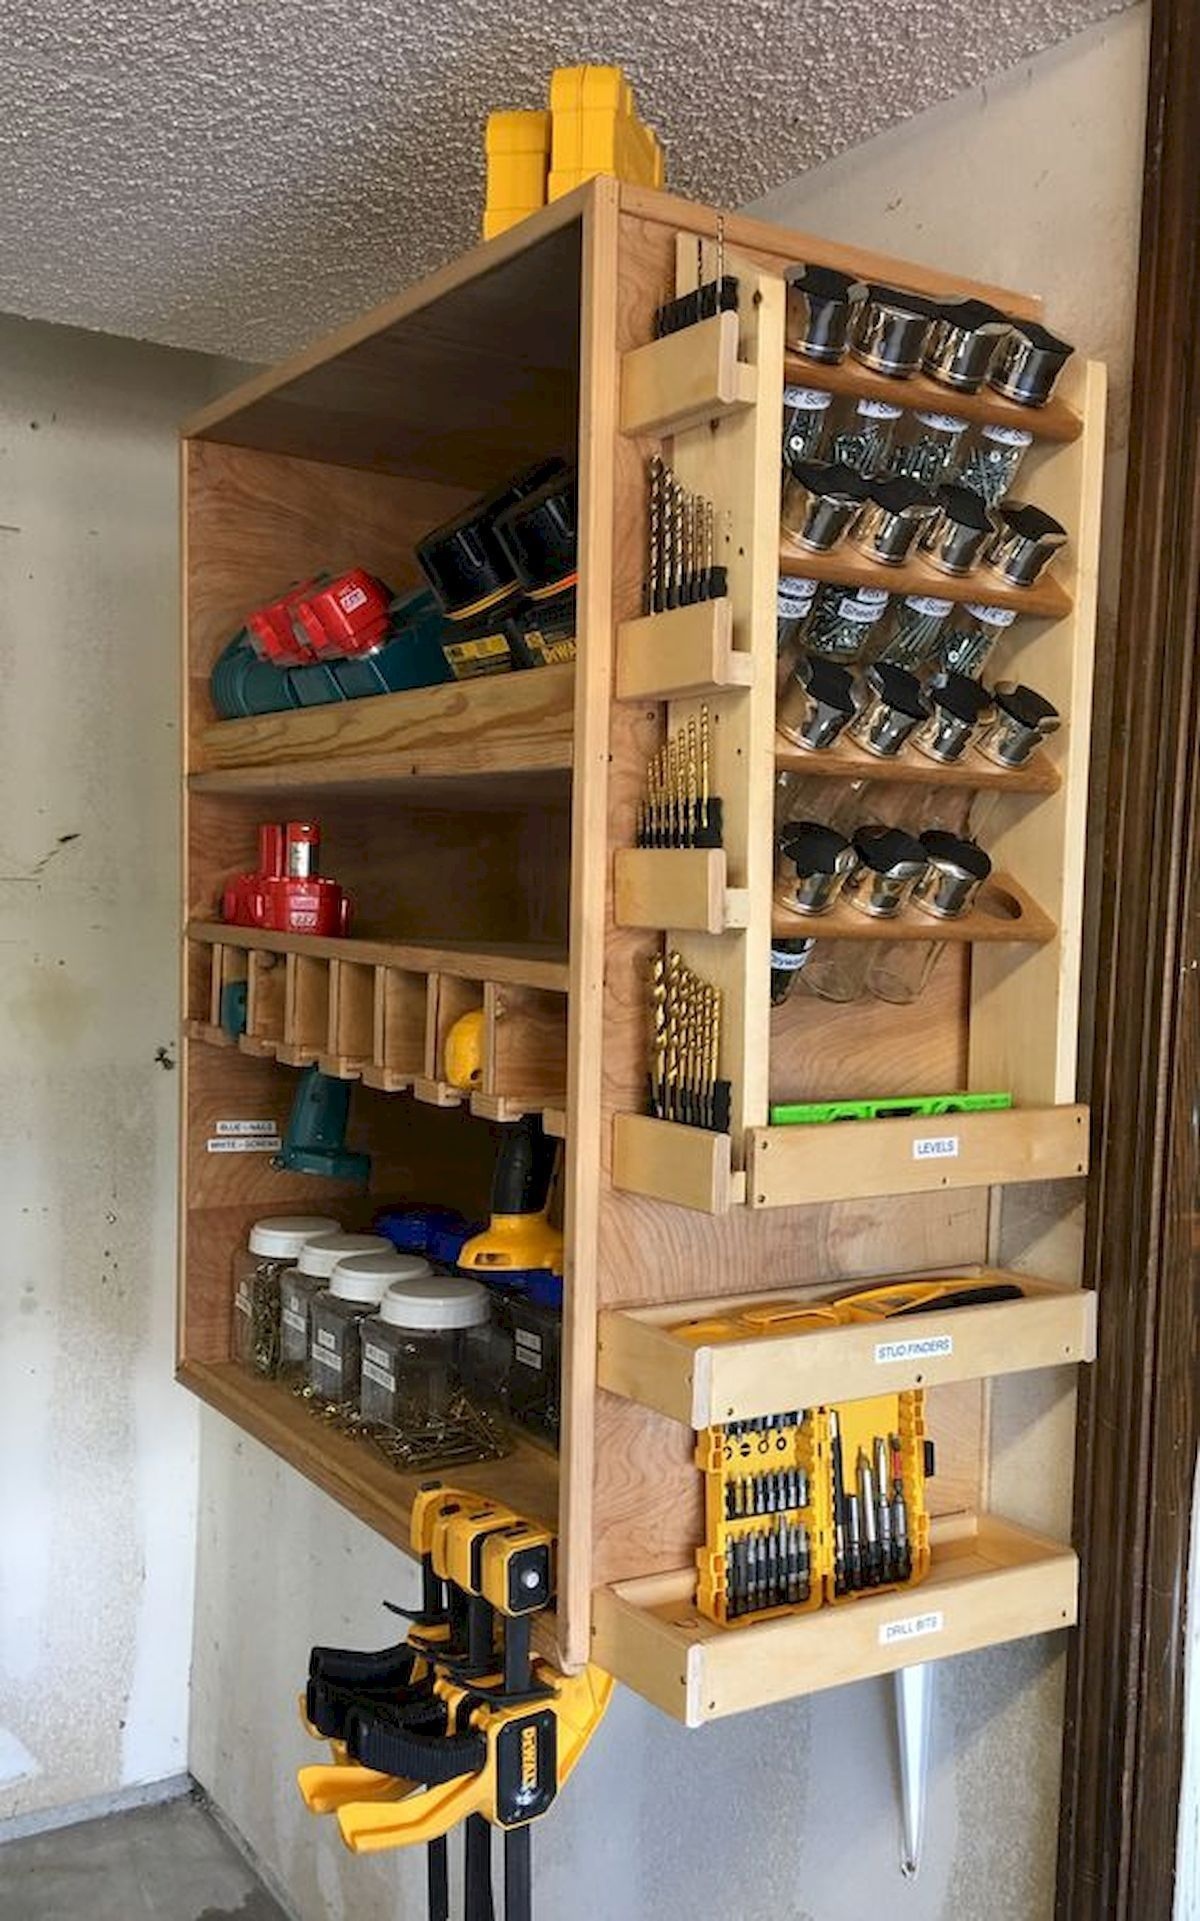 40 Inspiring Diy Garage Storage Design Ideas On A Budget 38